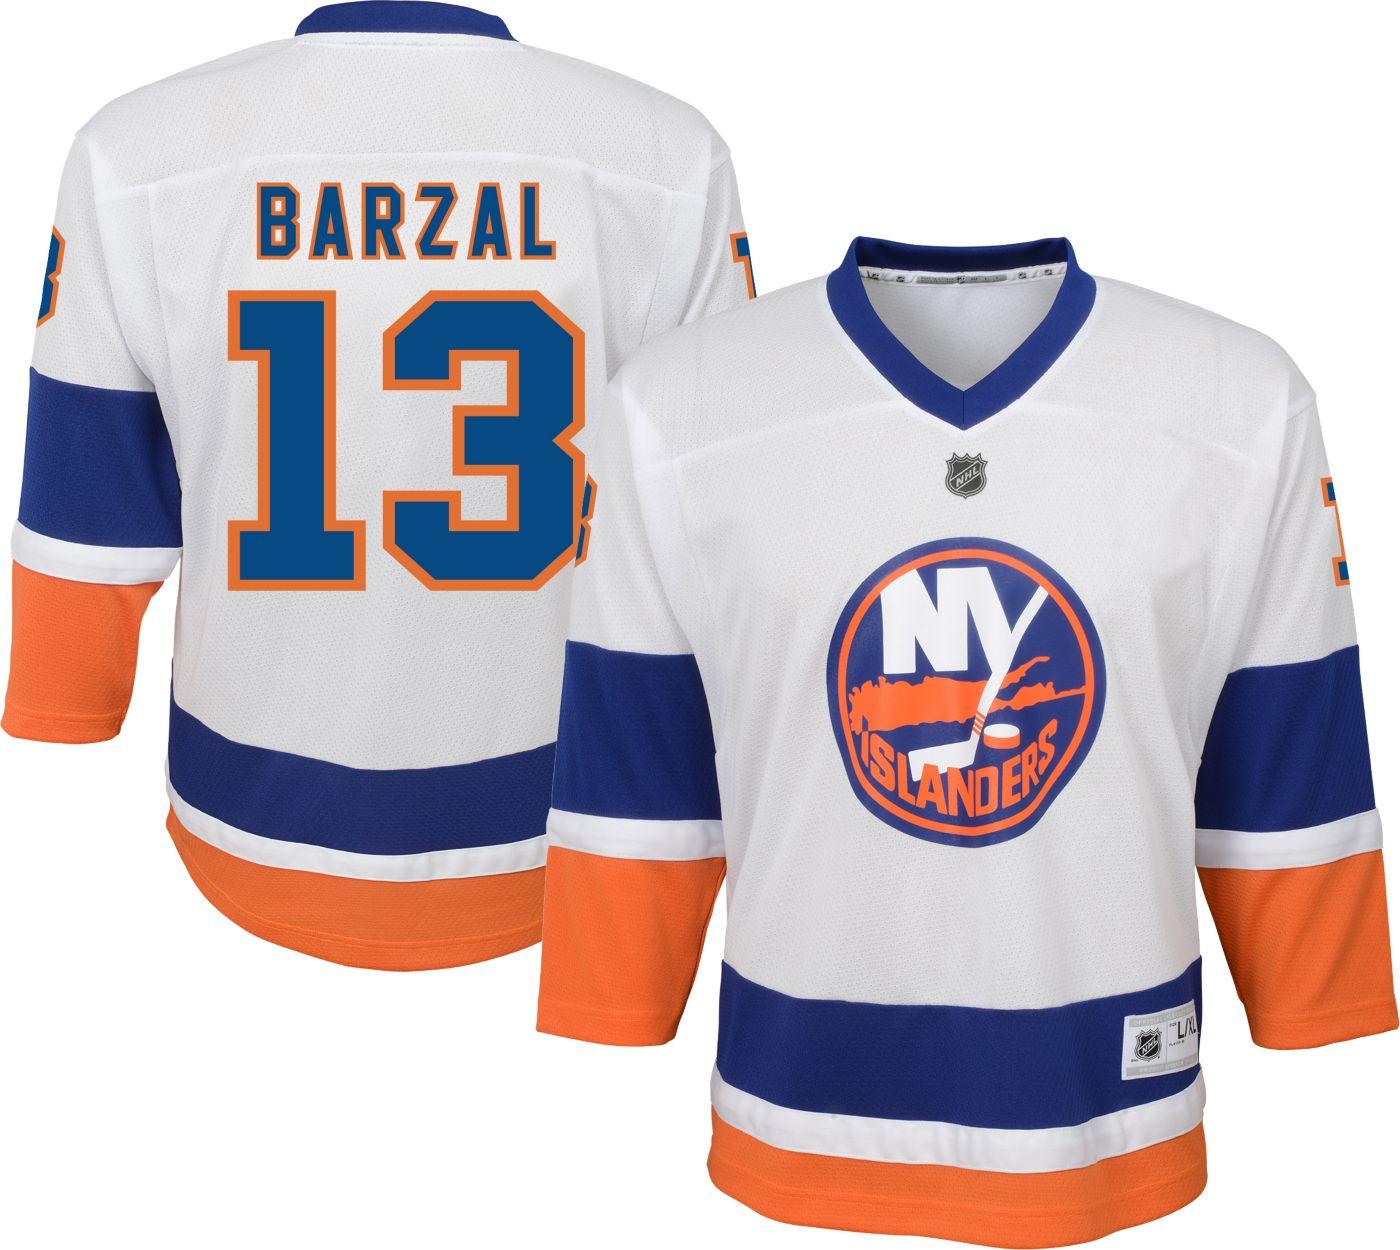 NHL Youth New York Islanders Mathew Barazal #13 Replica Away Jersey